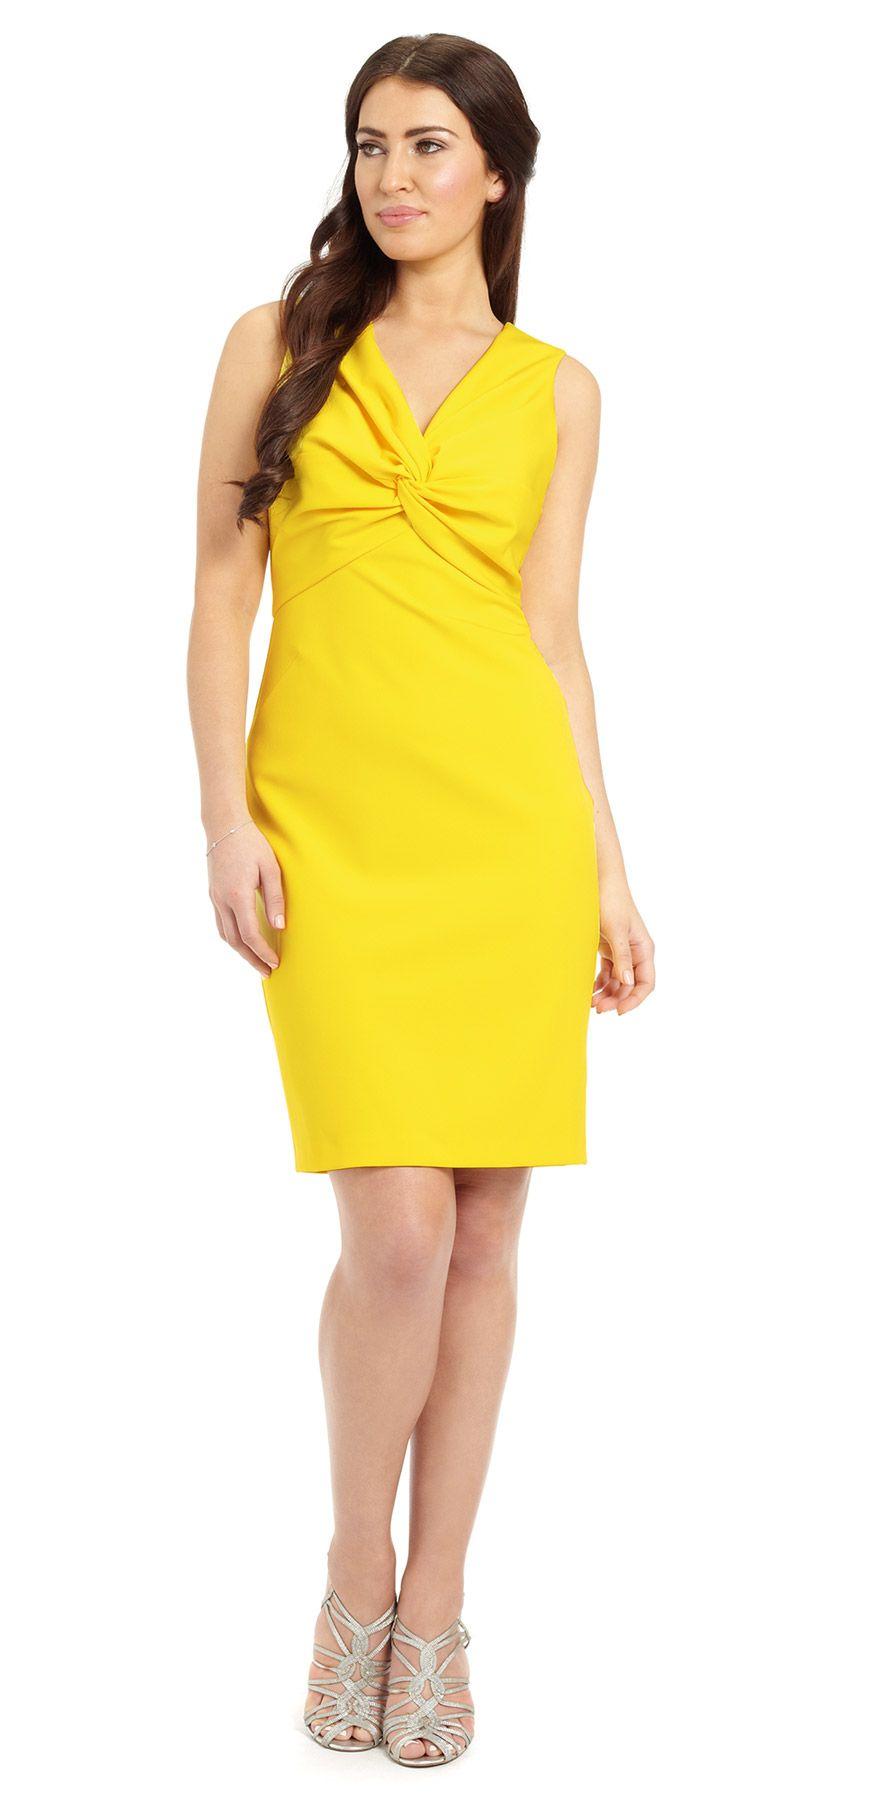 Alba bodycon vneck short dress fashion lady pinterest summer